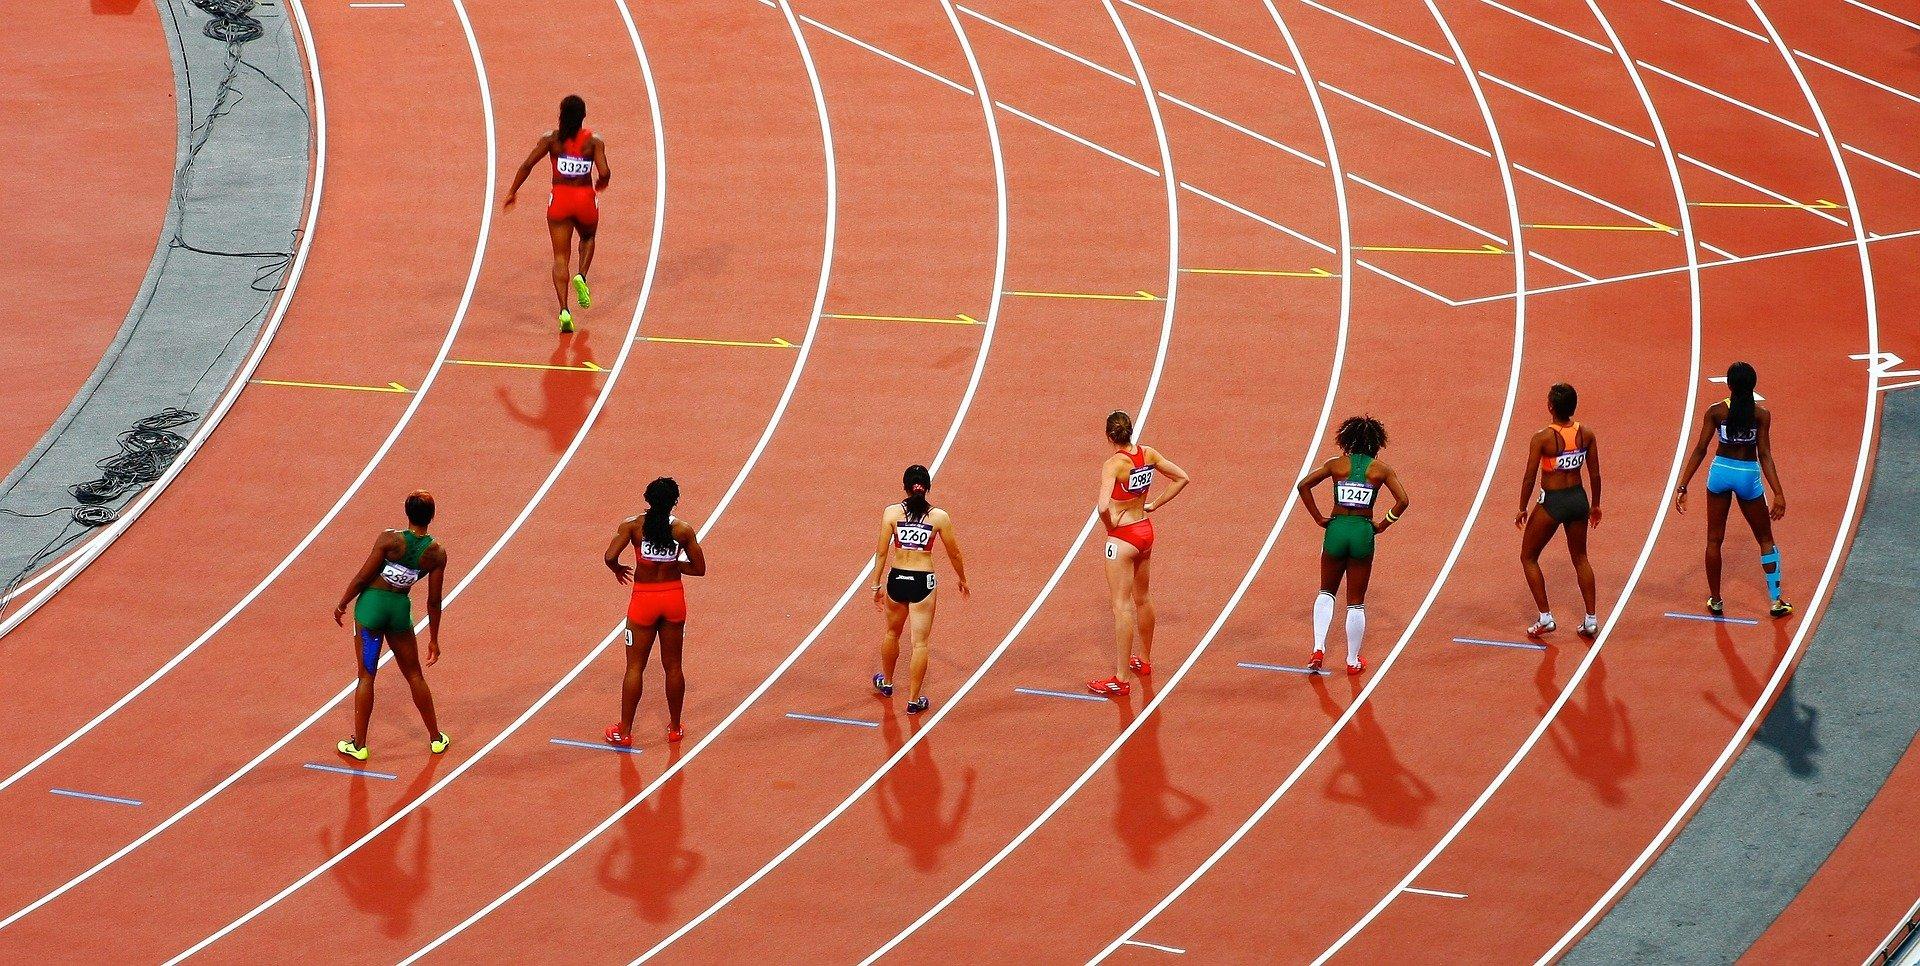 Women running a race on a track